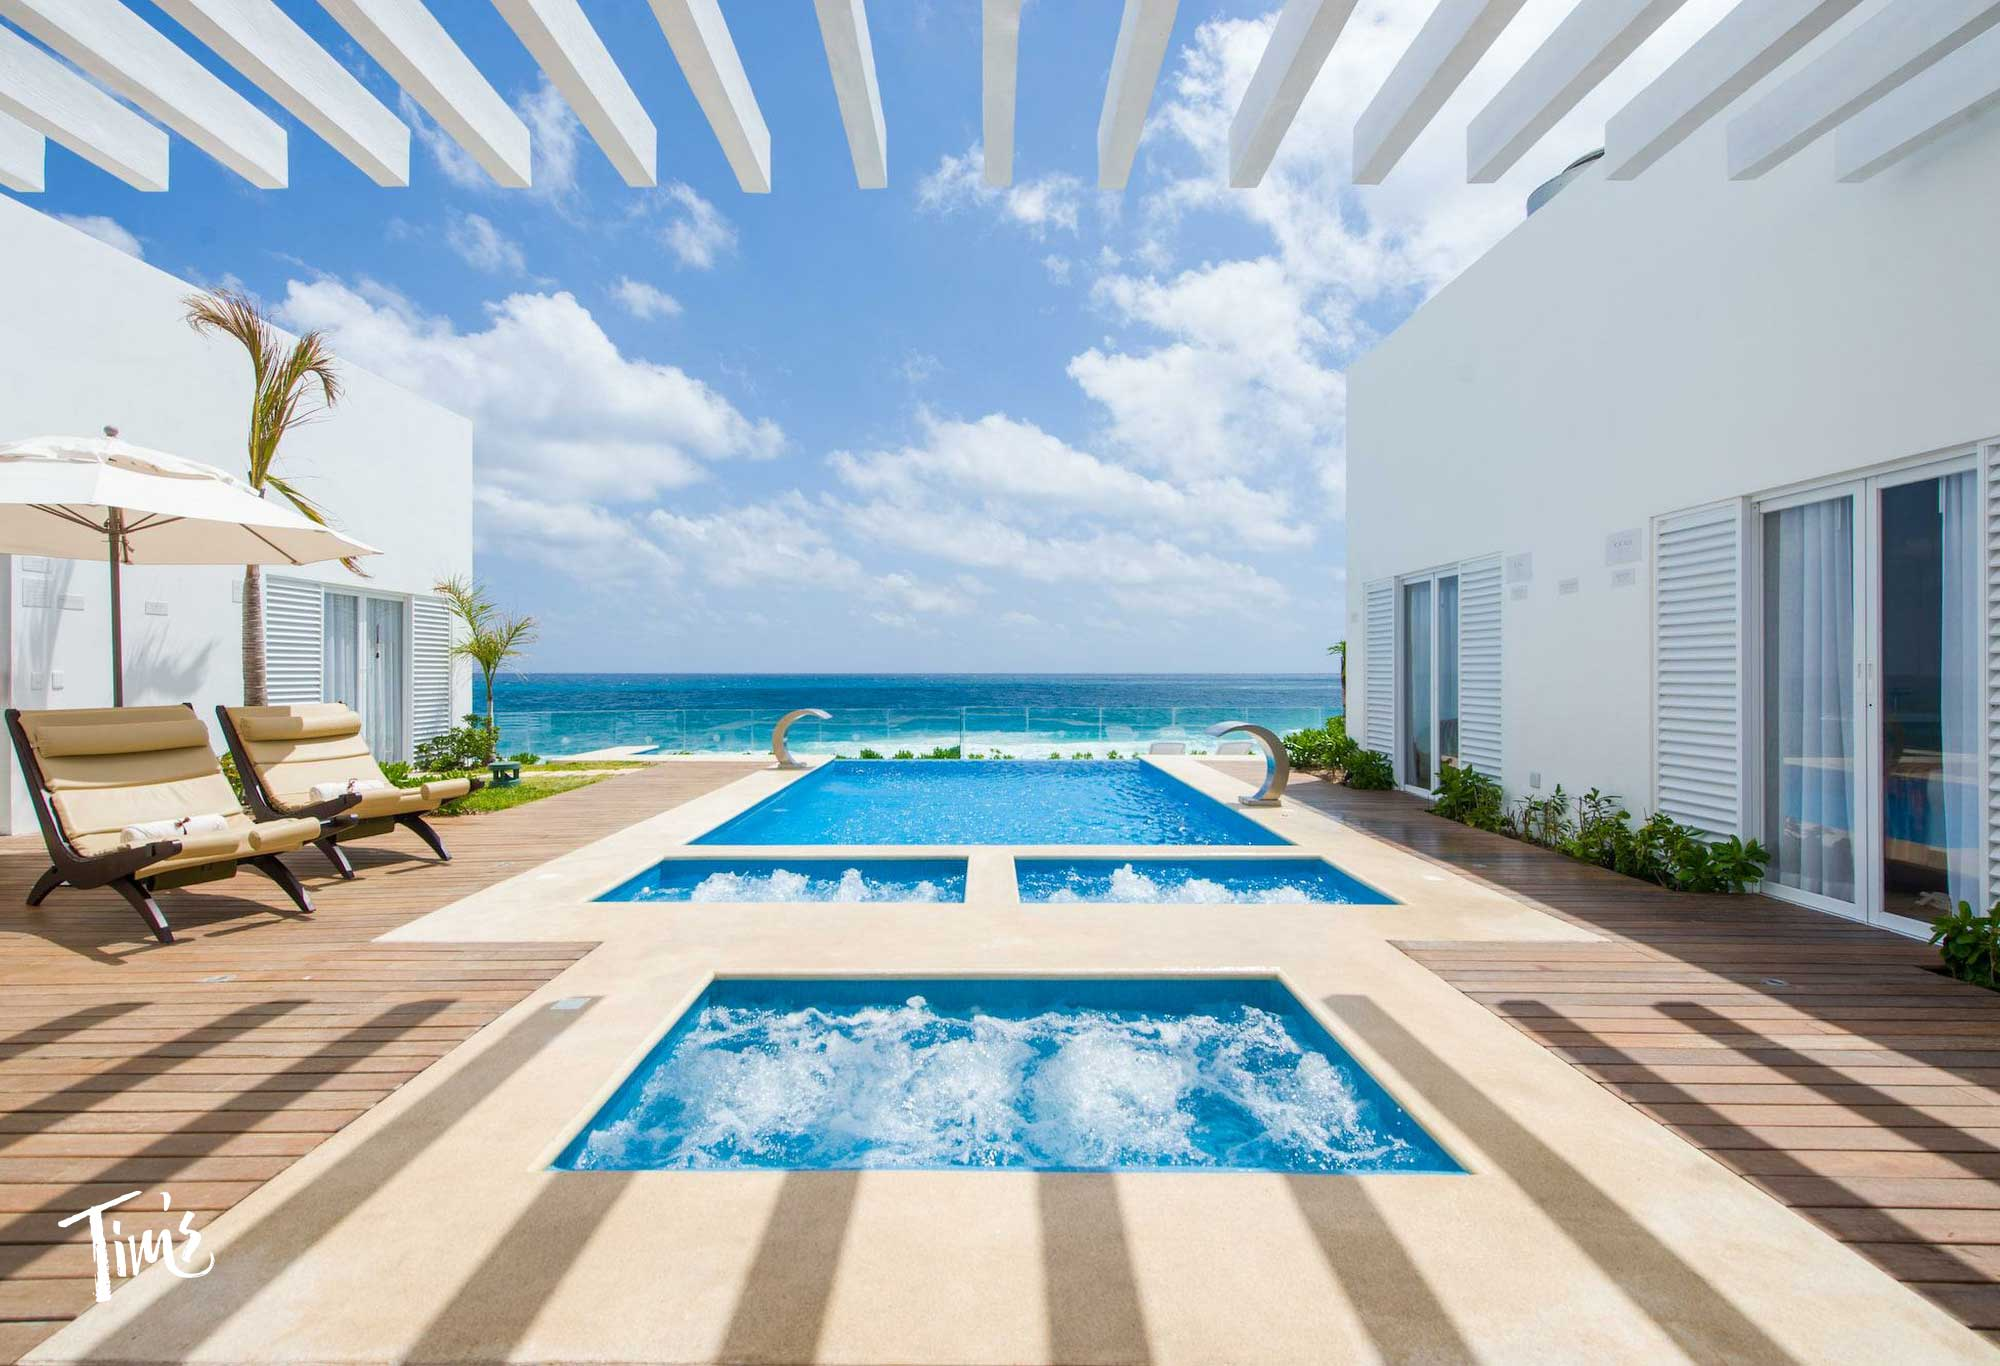 Hydro therapy pools at Oleo Playa Cancun